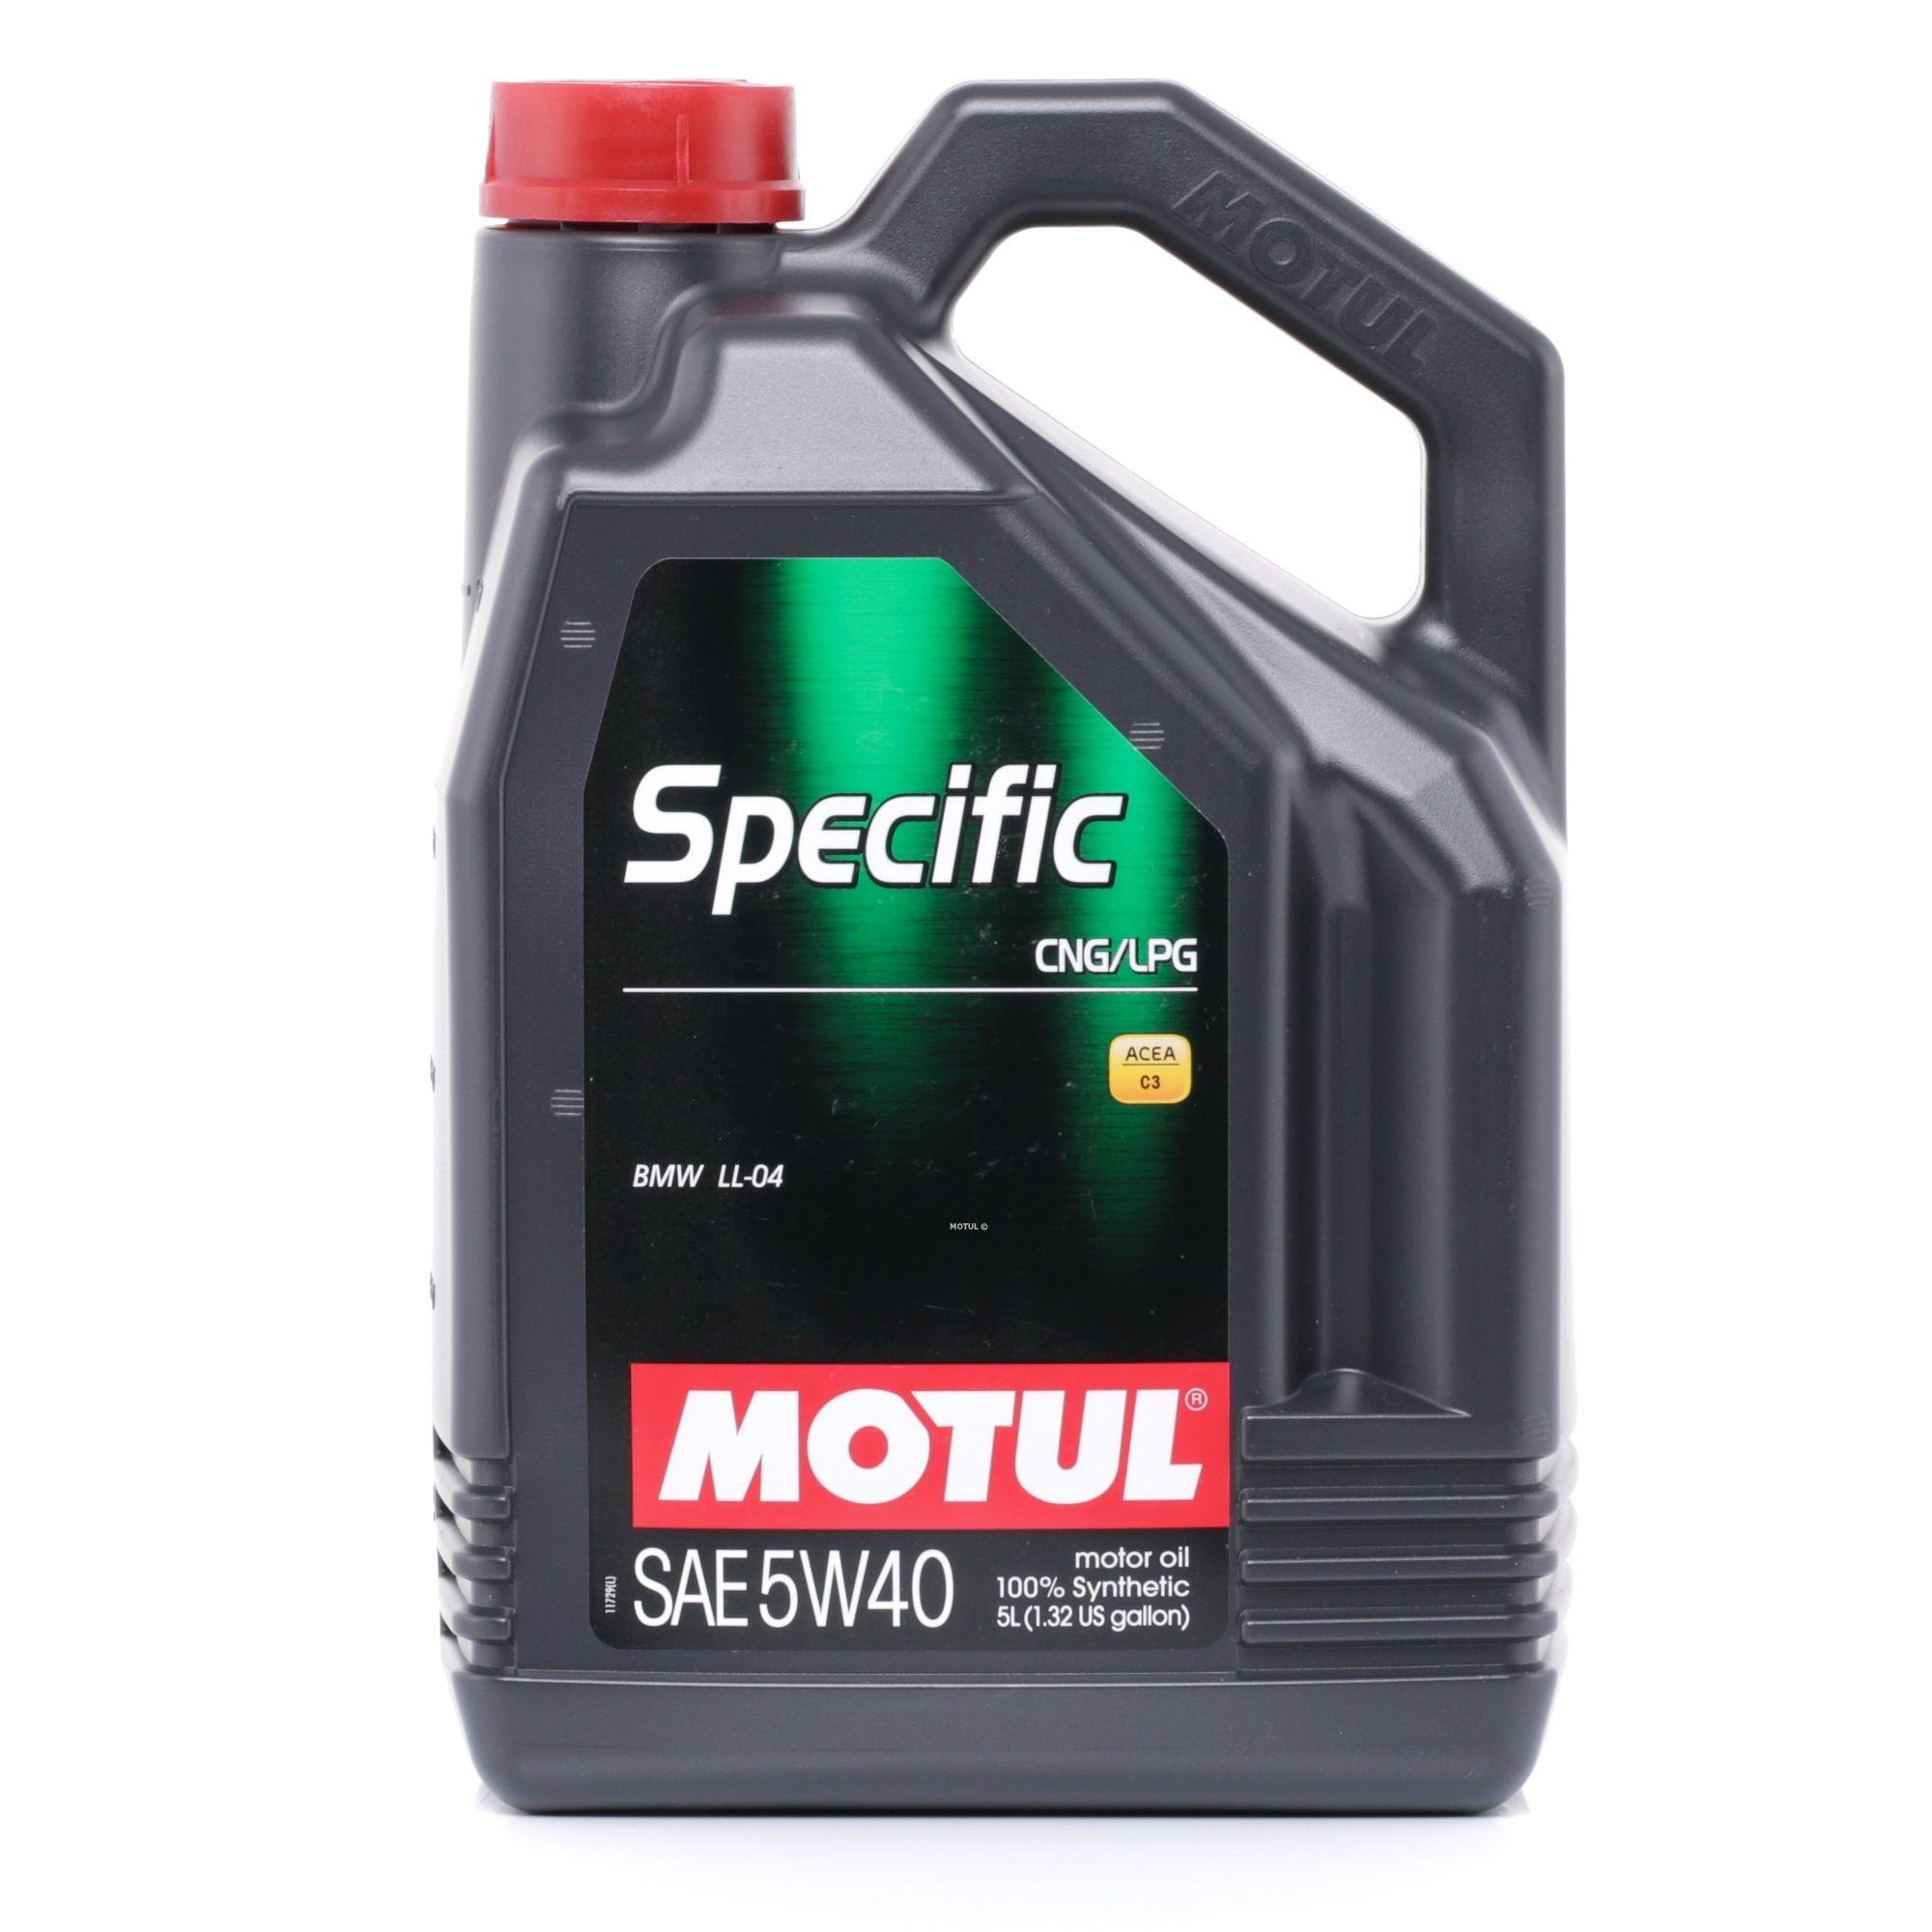 5W40 MOTUL SPECIFIC, CNG/LPG 5W-40, 5l, Synthetiköl Motoröl 101719 günstig kaufen